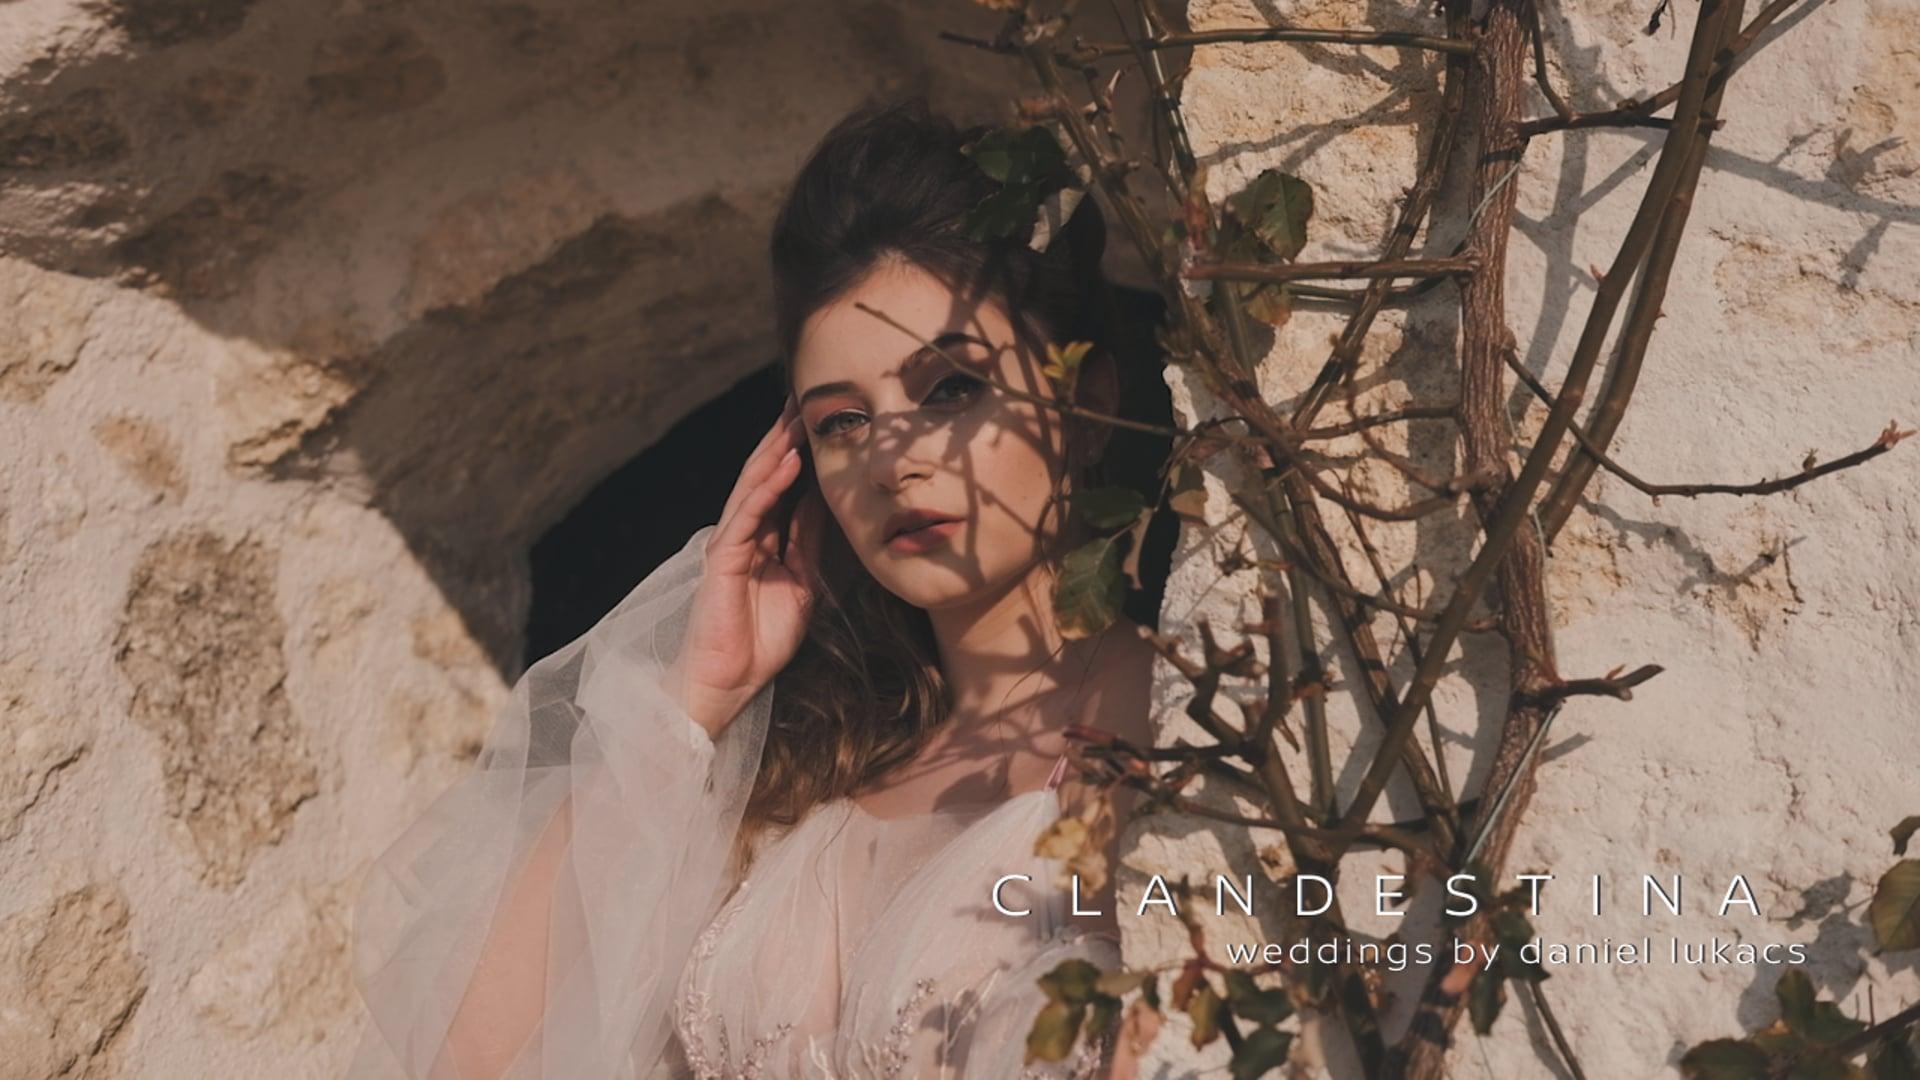 CLANDESTINA // Styled shoot